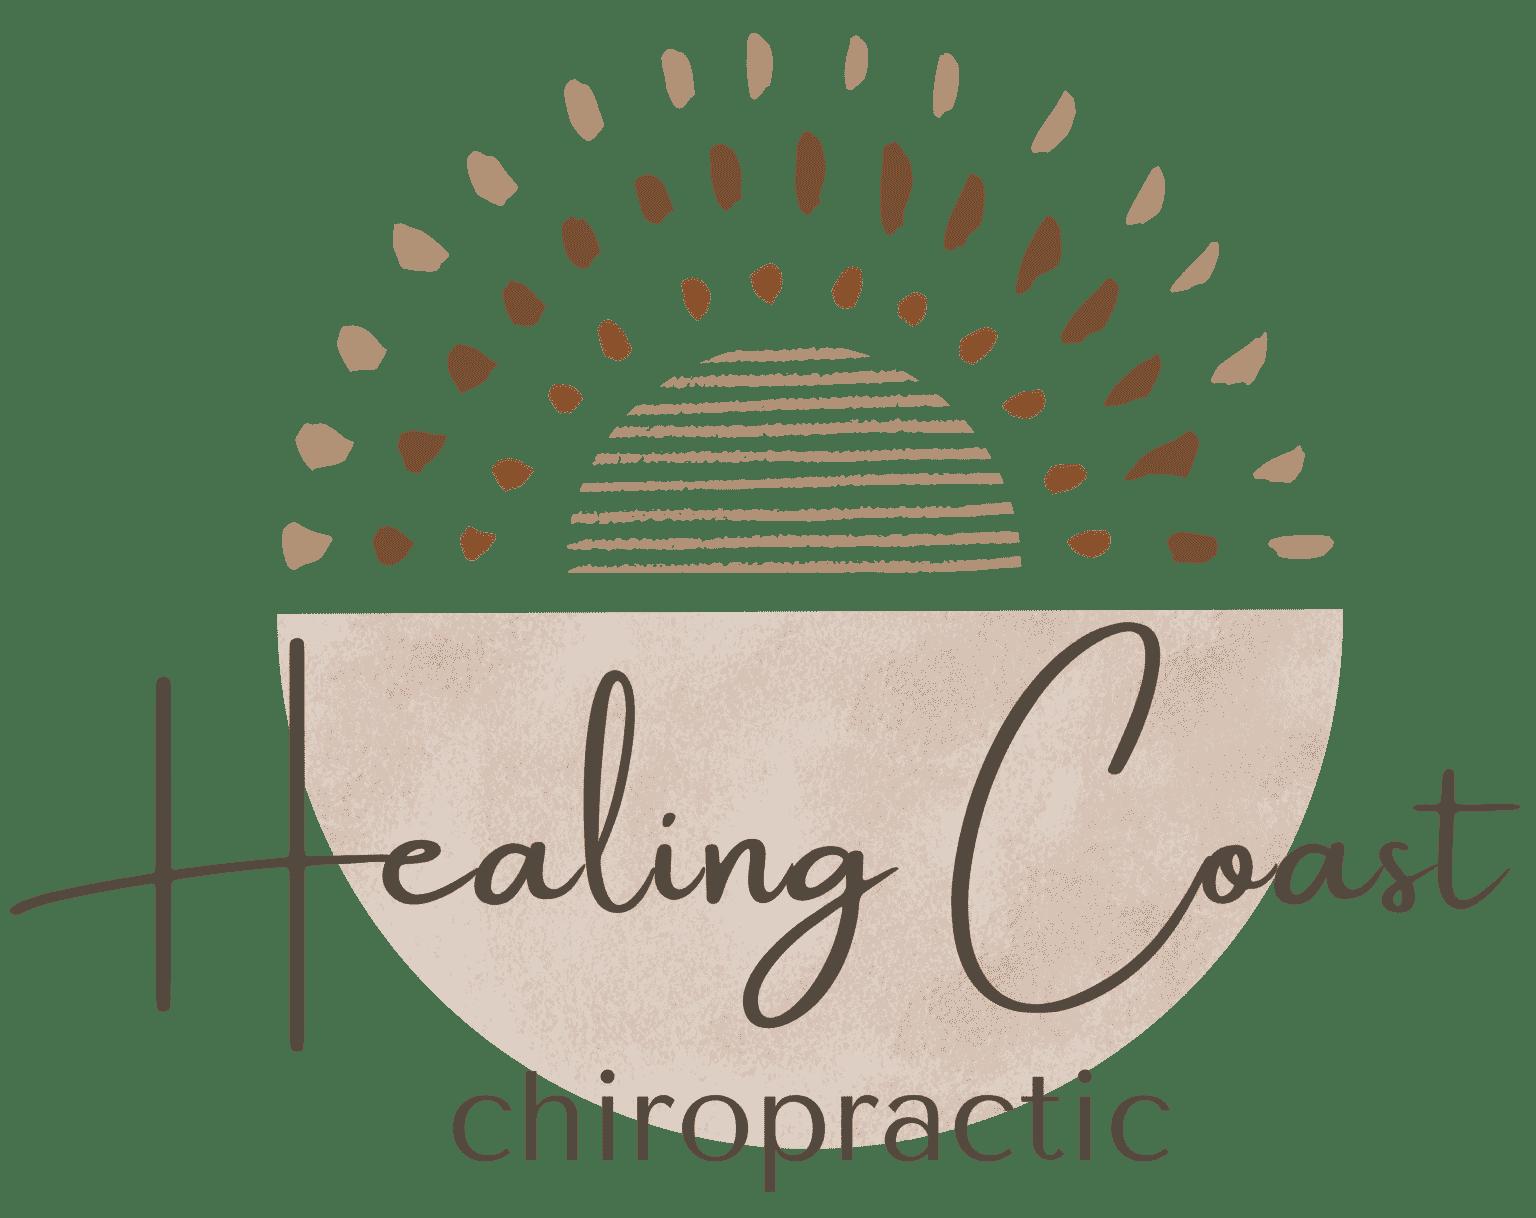 Healing Coast Chiropractic Logo